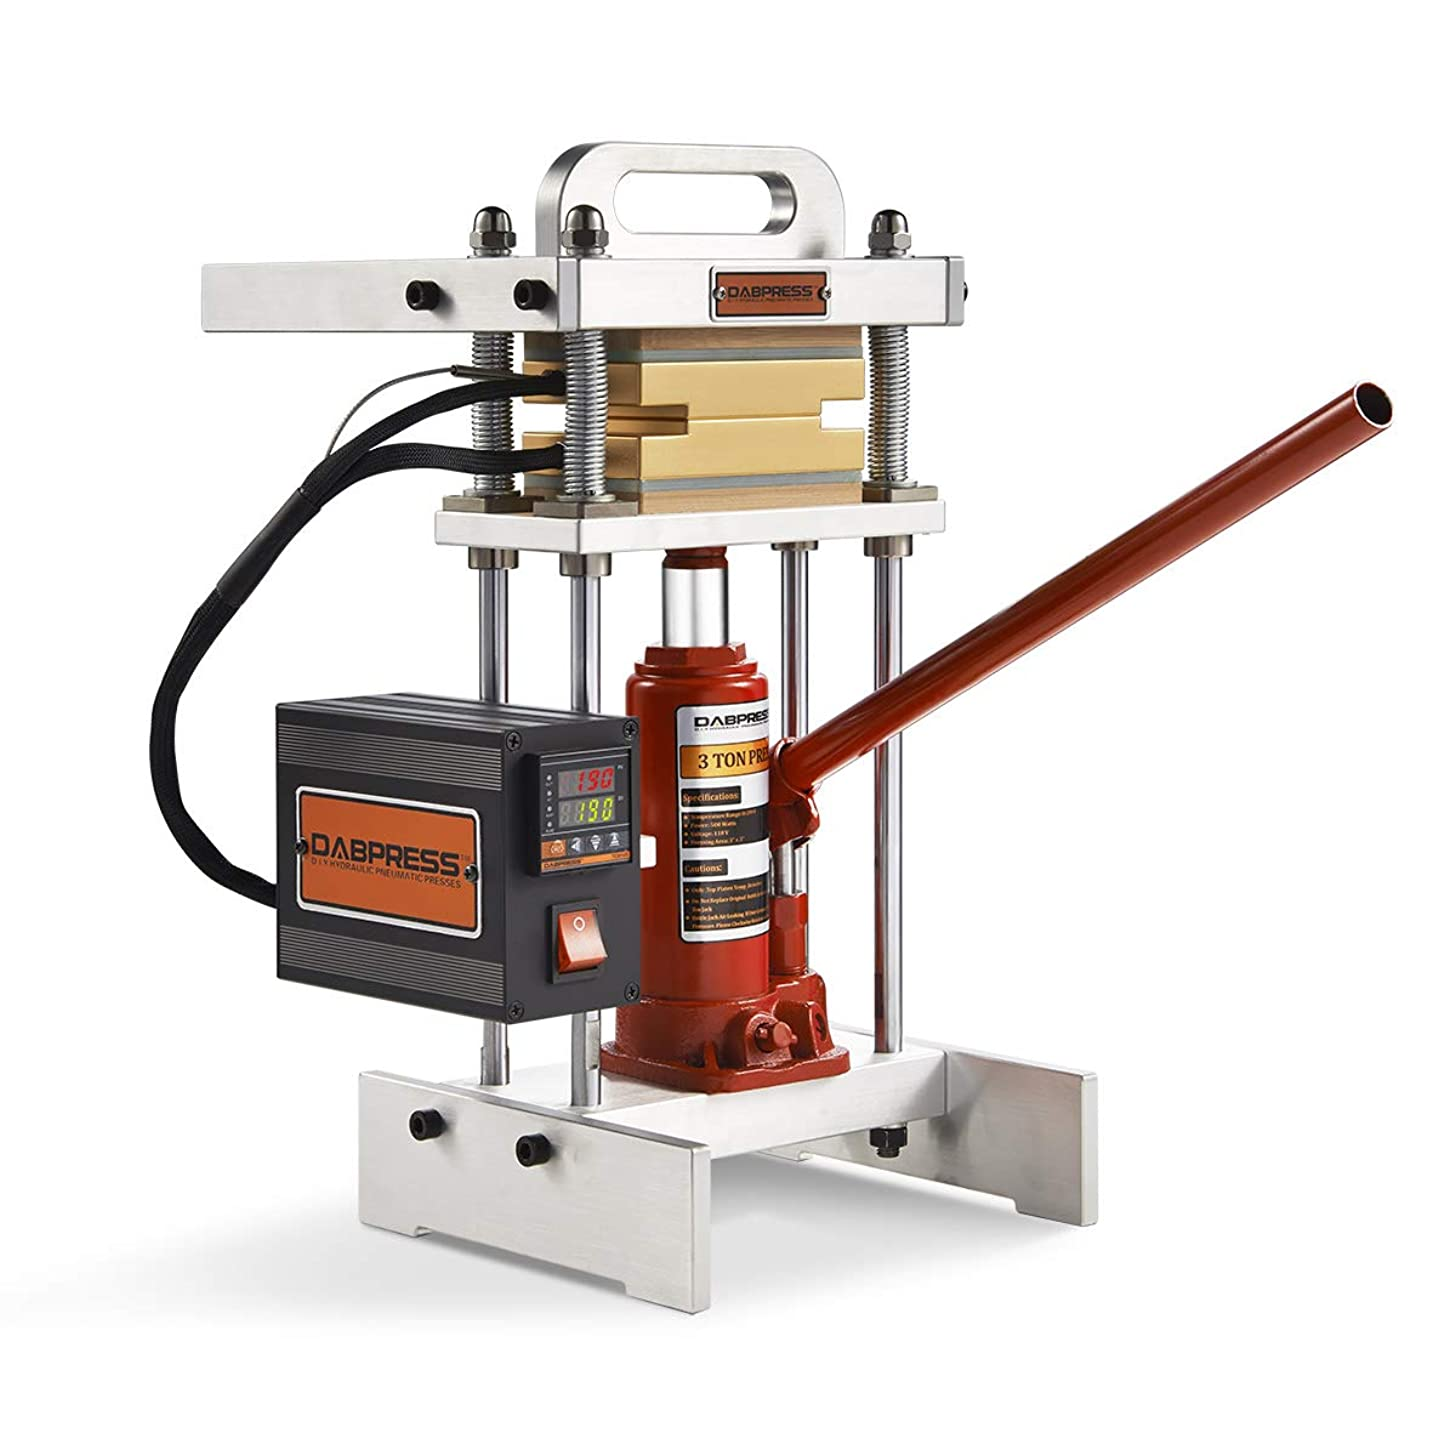 3 Ton Hydraulic Jack Heat Press | dp-bj3t33 | 3x3 Inch Anodized Heat Press Plates | 500 Watts | Dual Heating Machine | Accurate Temp Detected